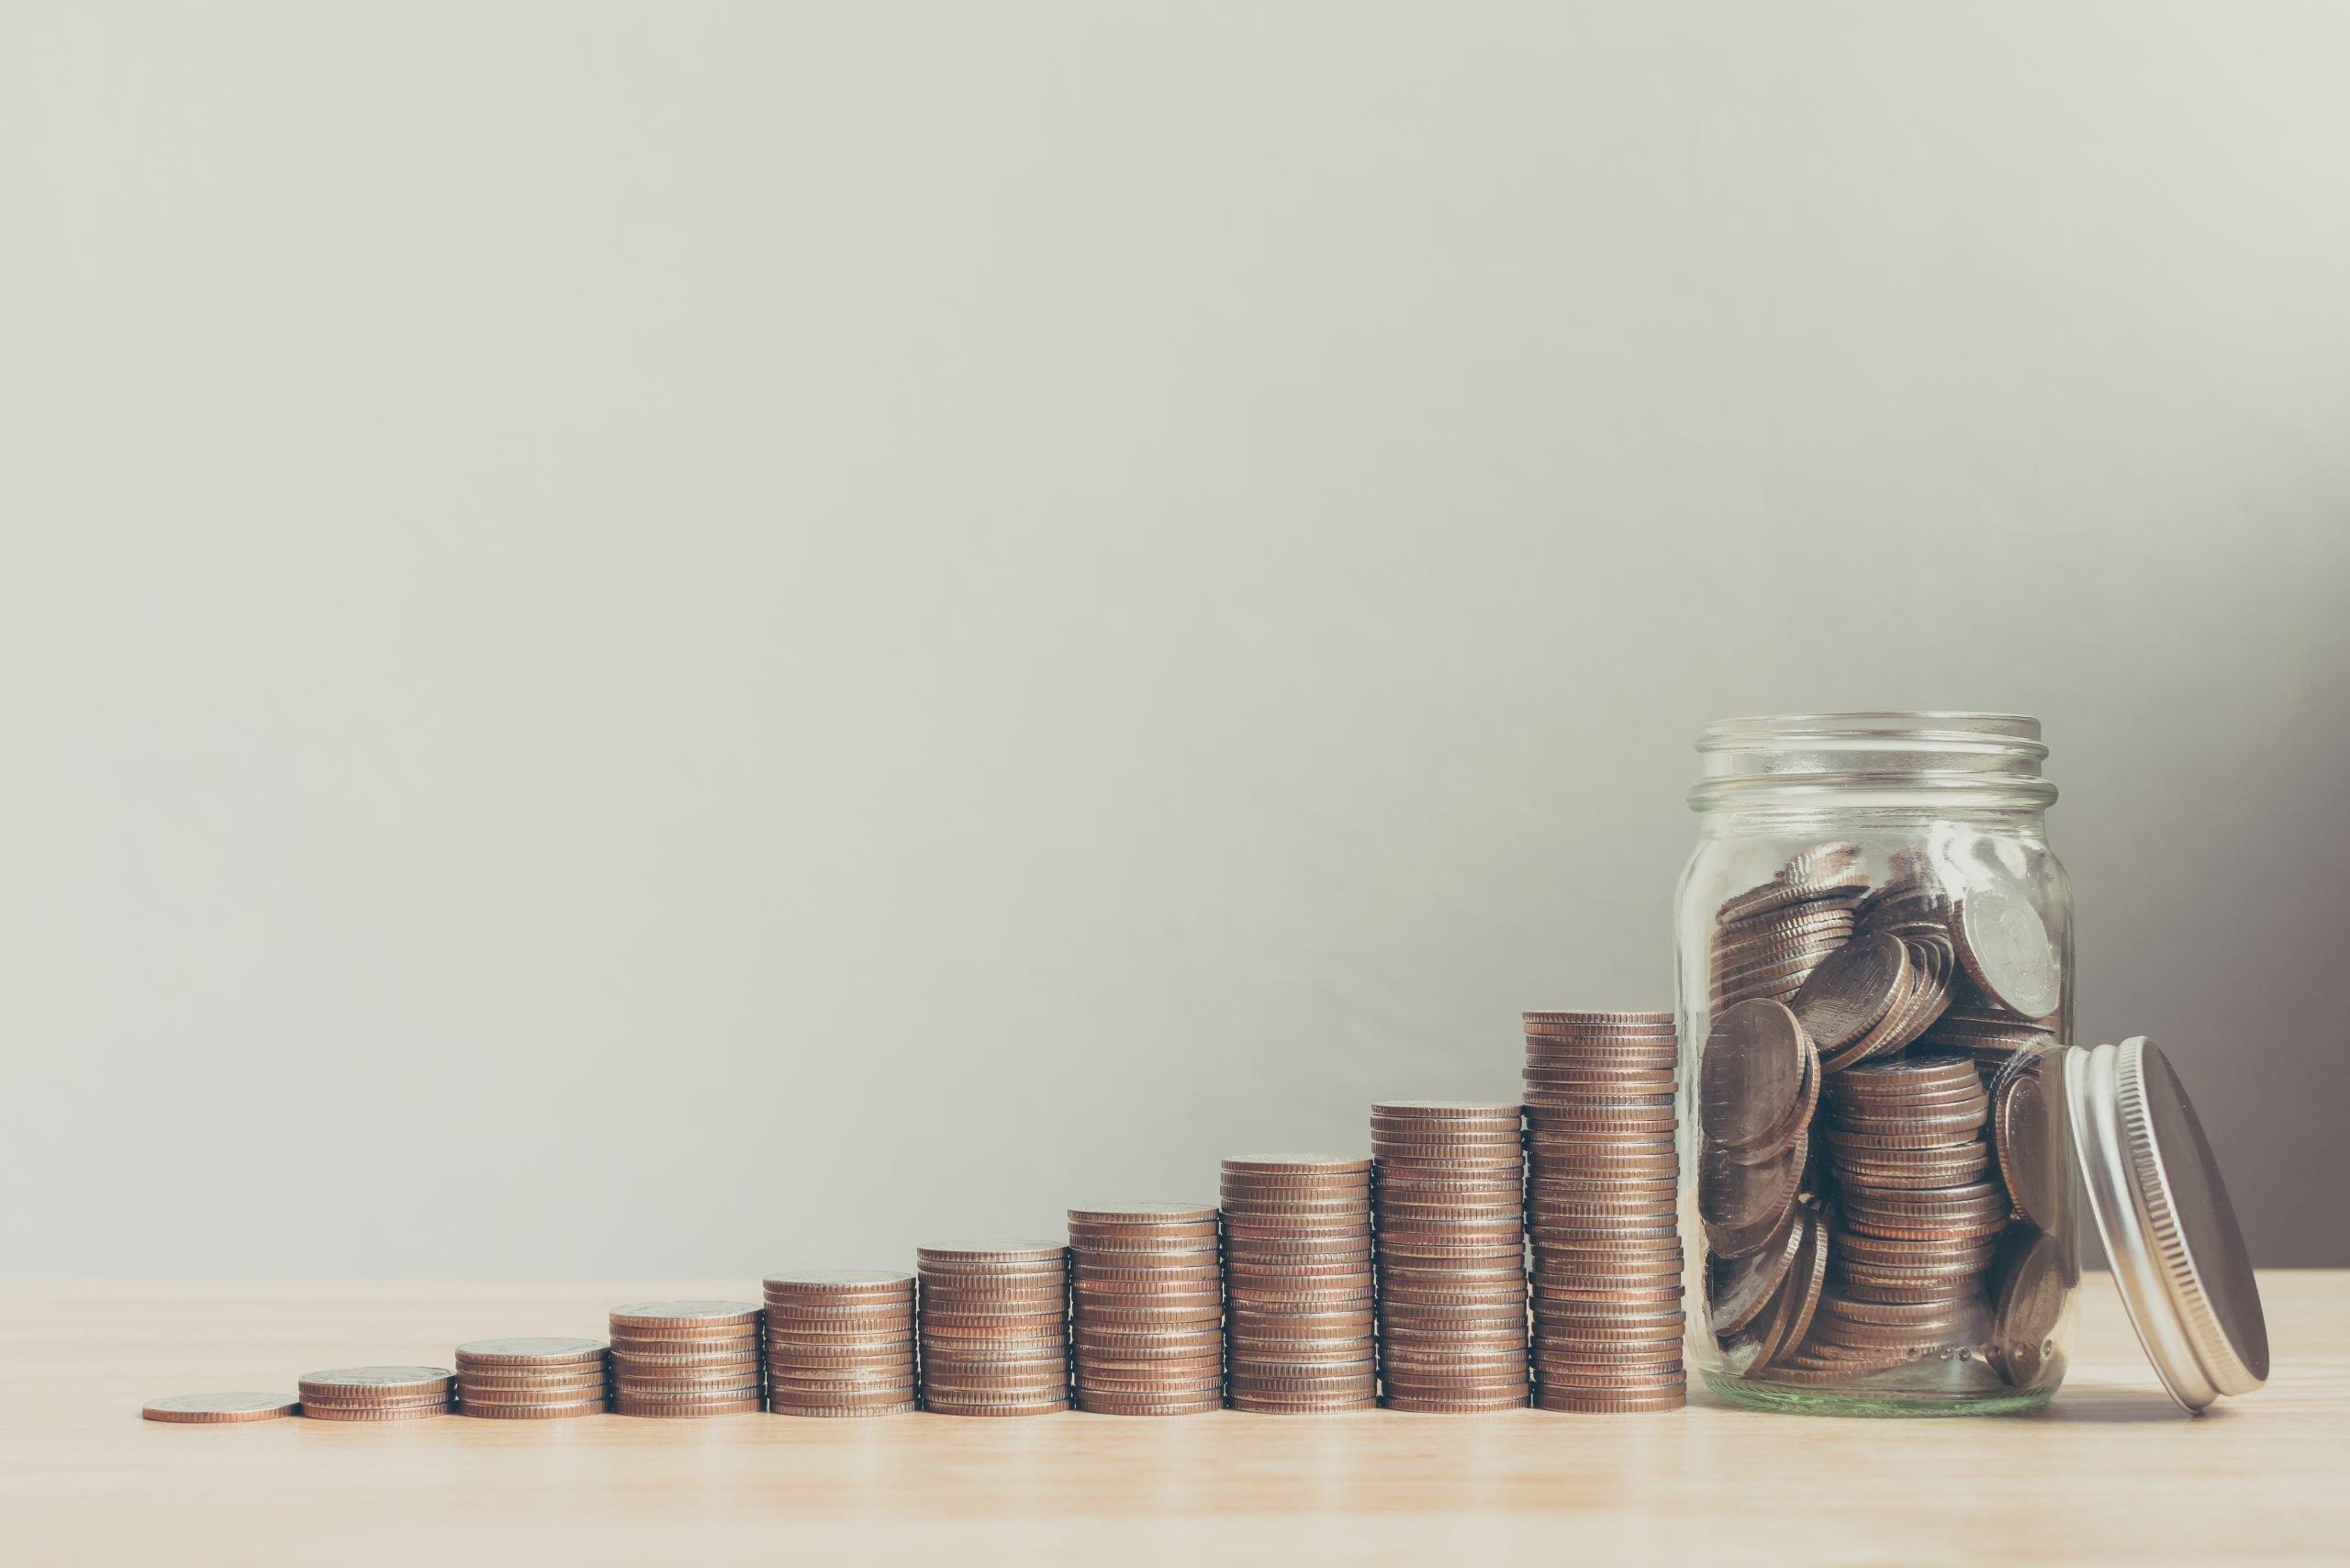 rmda-ss-financial-industry-coin-jar.2560.1708